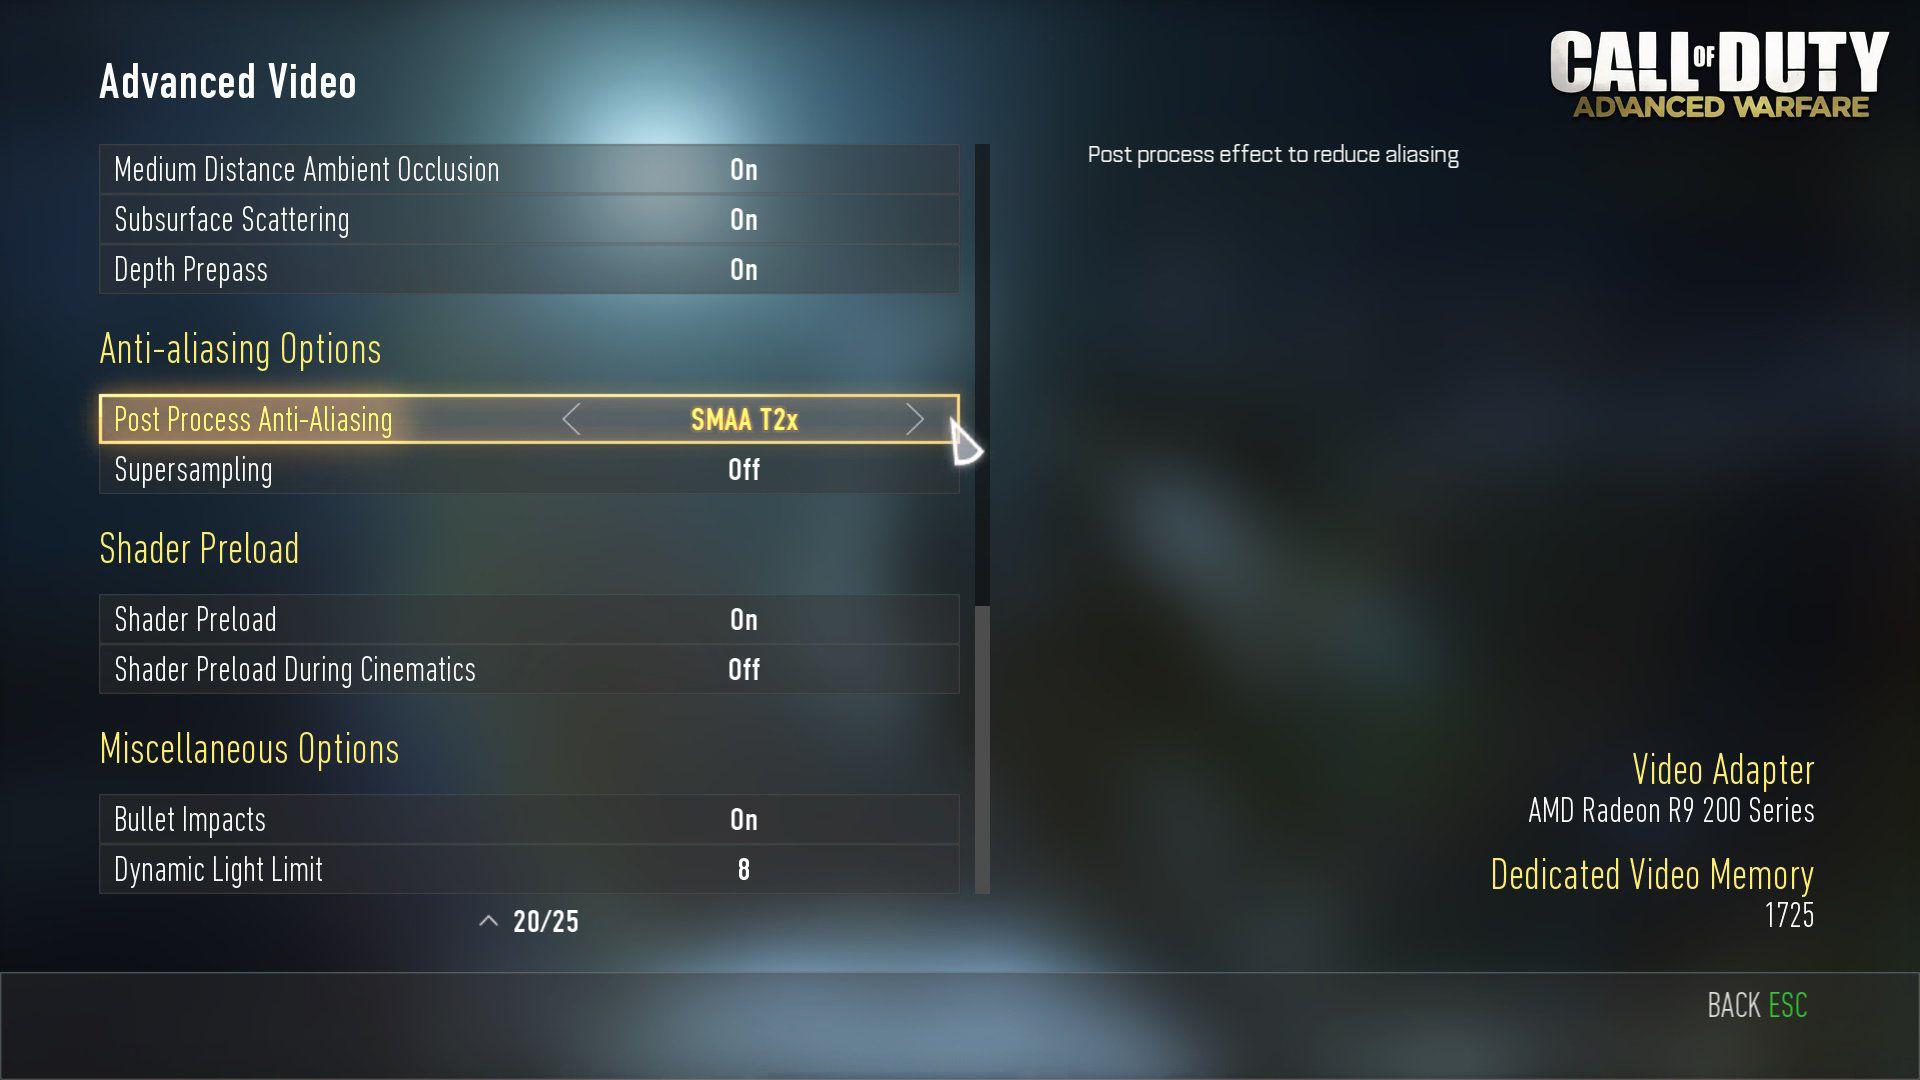 Call of Duty Advanced Warfare Optimal Video Ayarları